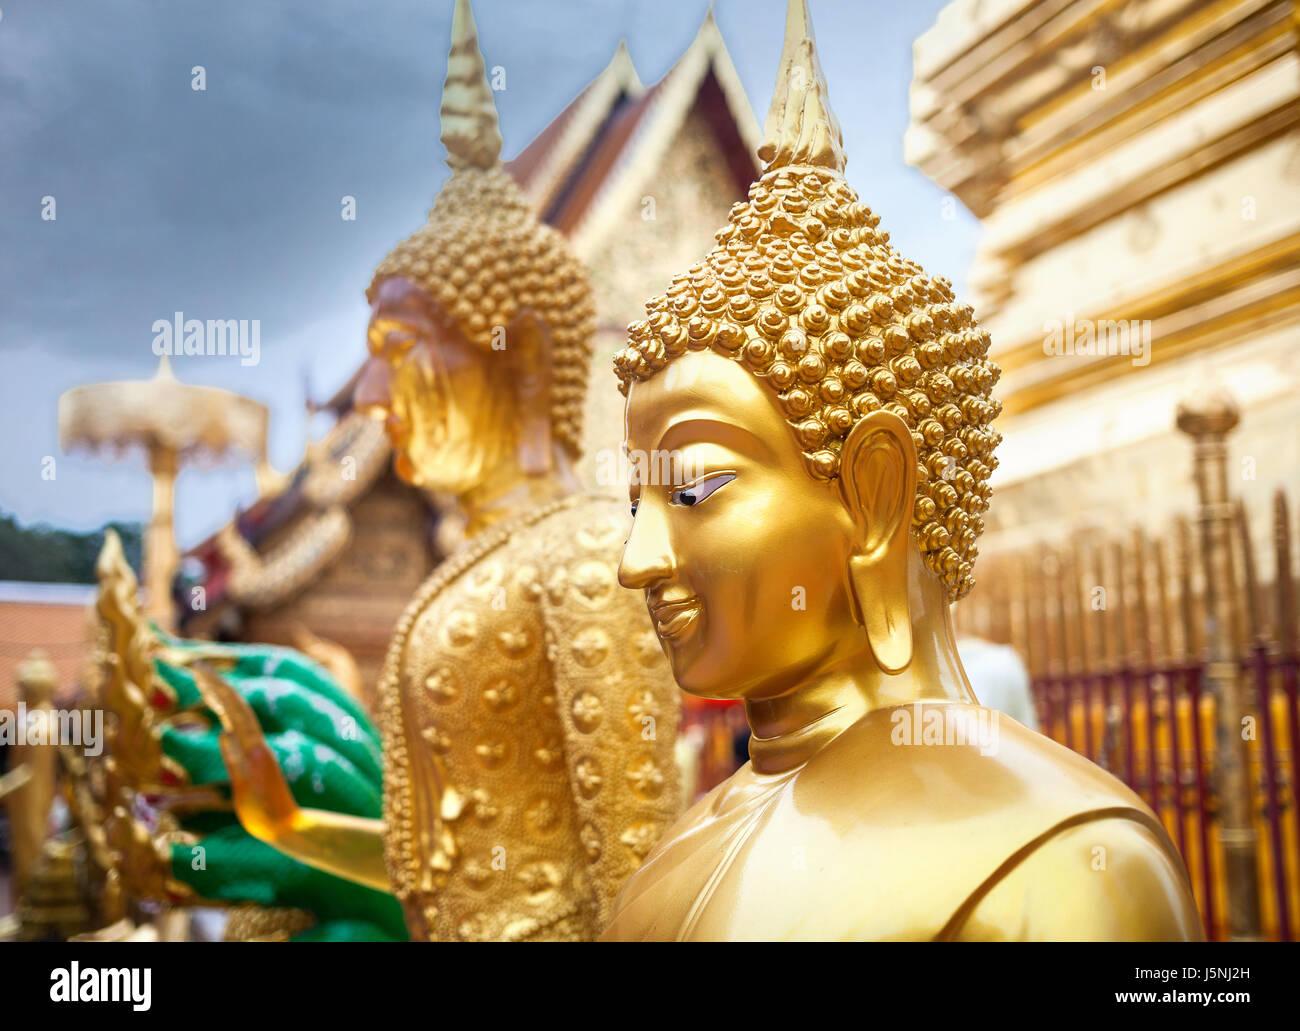 Golden Buddha statue in Wat Doi Suthep, Ciang Mai, Thailand - Stock Image